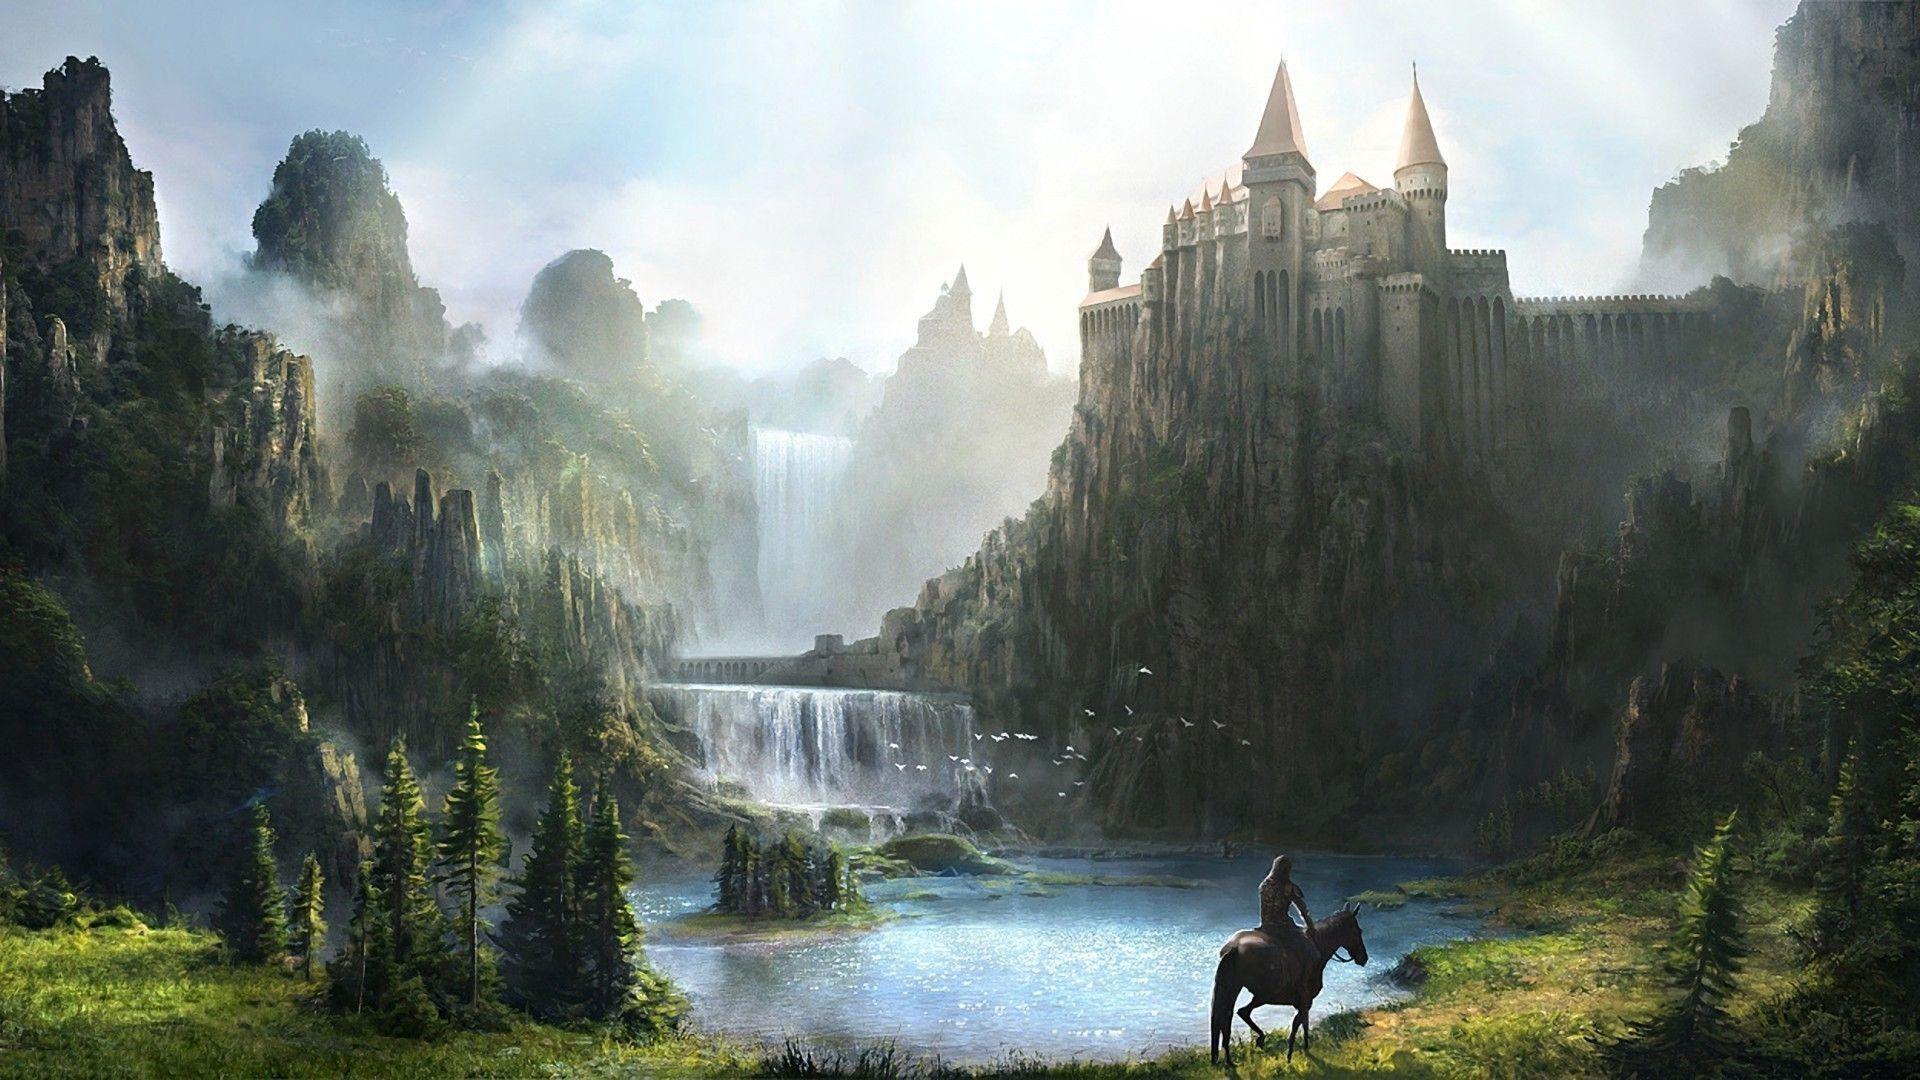 Fantasy Waterfall Castle HD Wallpapers Man Riding Horse Waterfall Lake 1920x1080